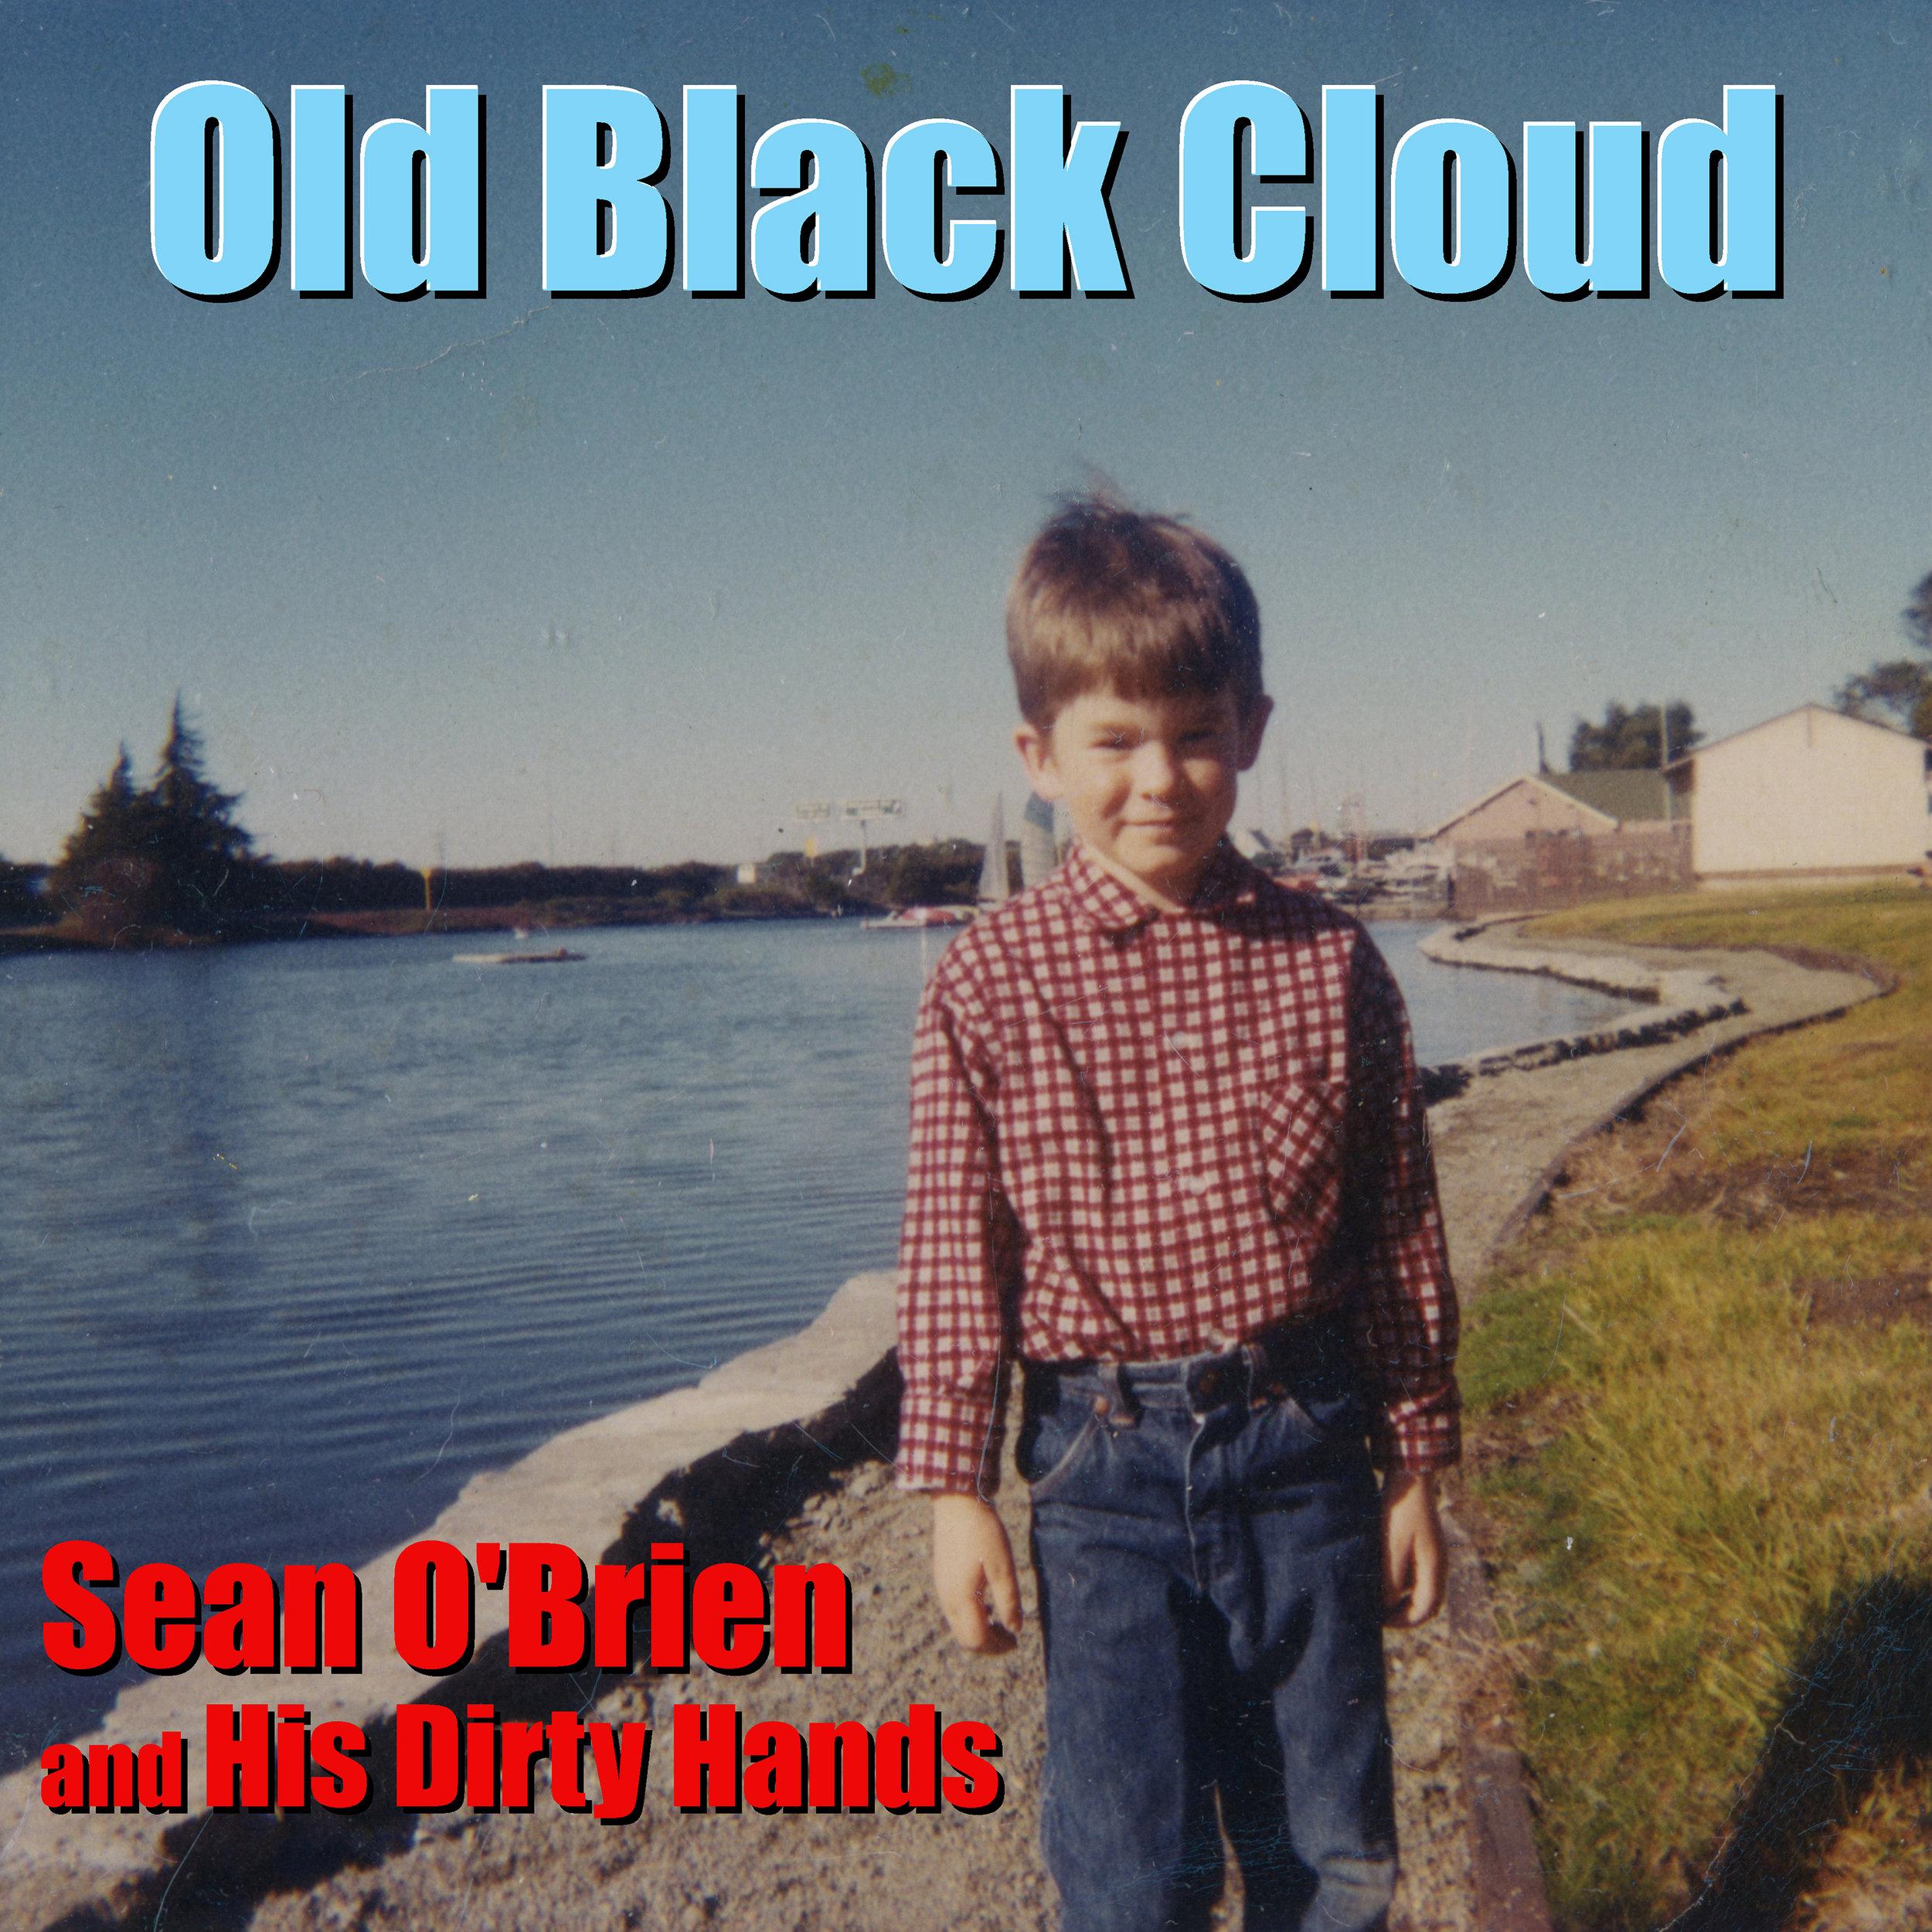 Old Black Cloud - Digital single cover